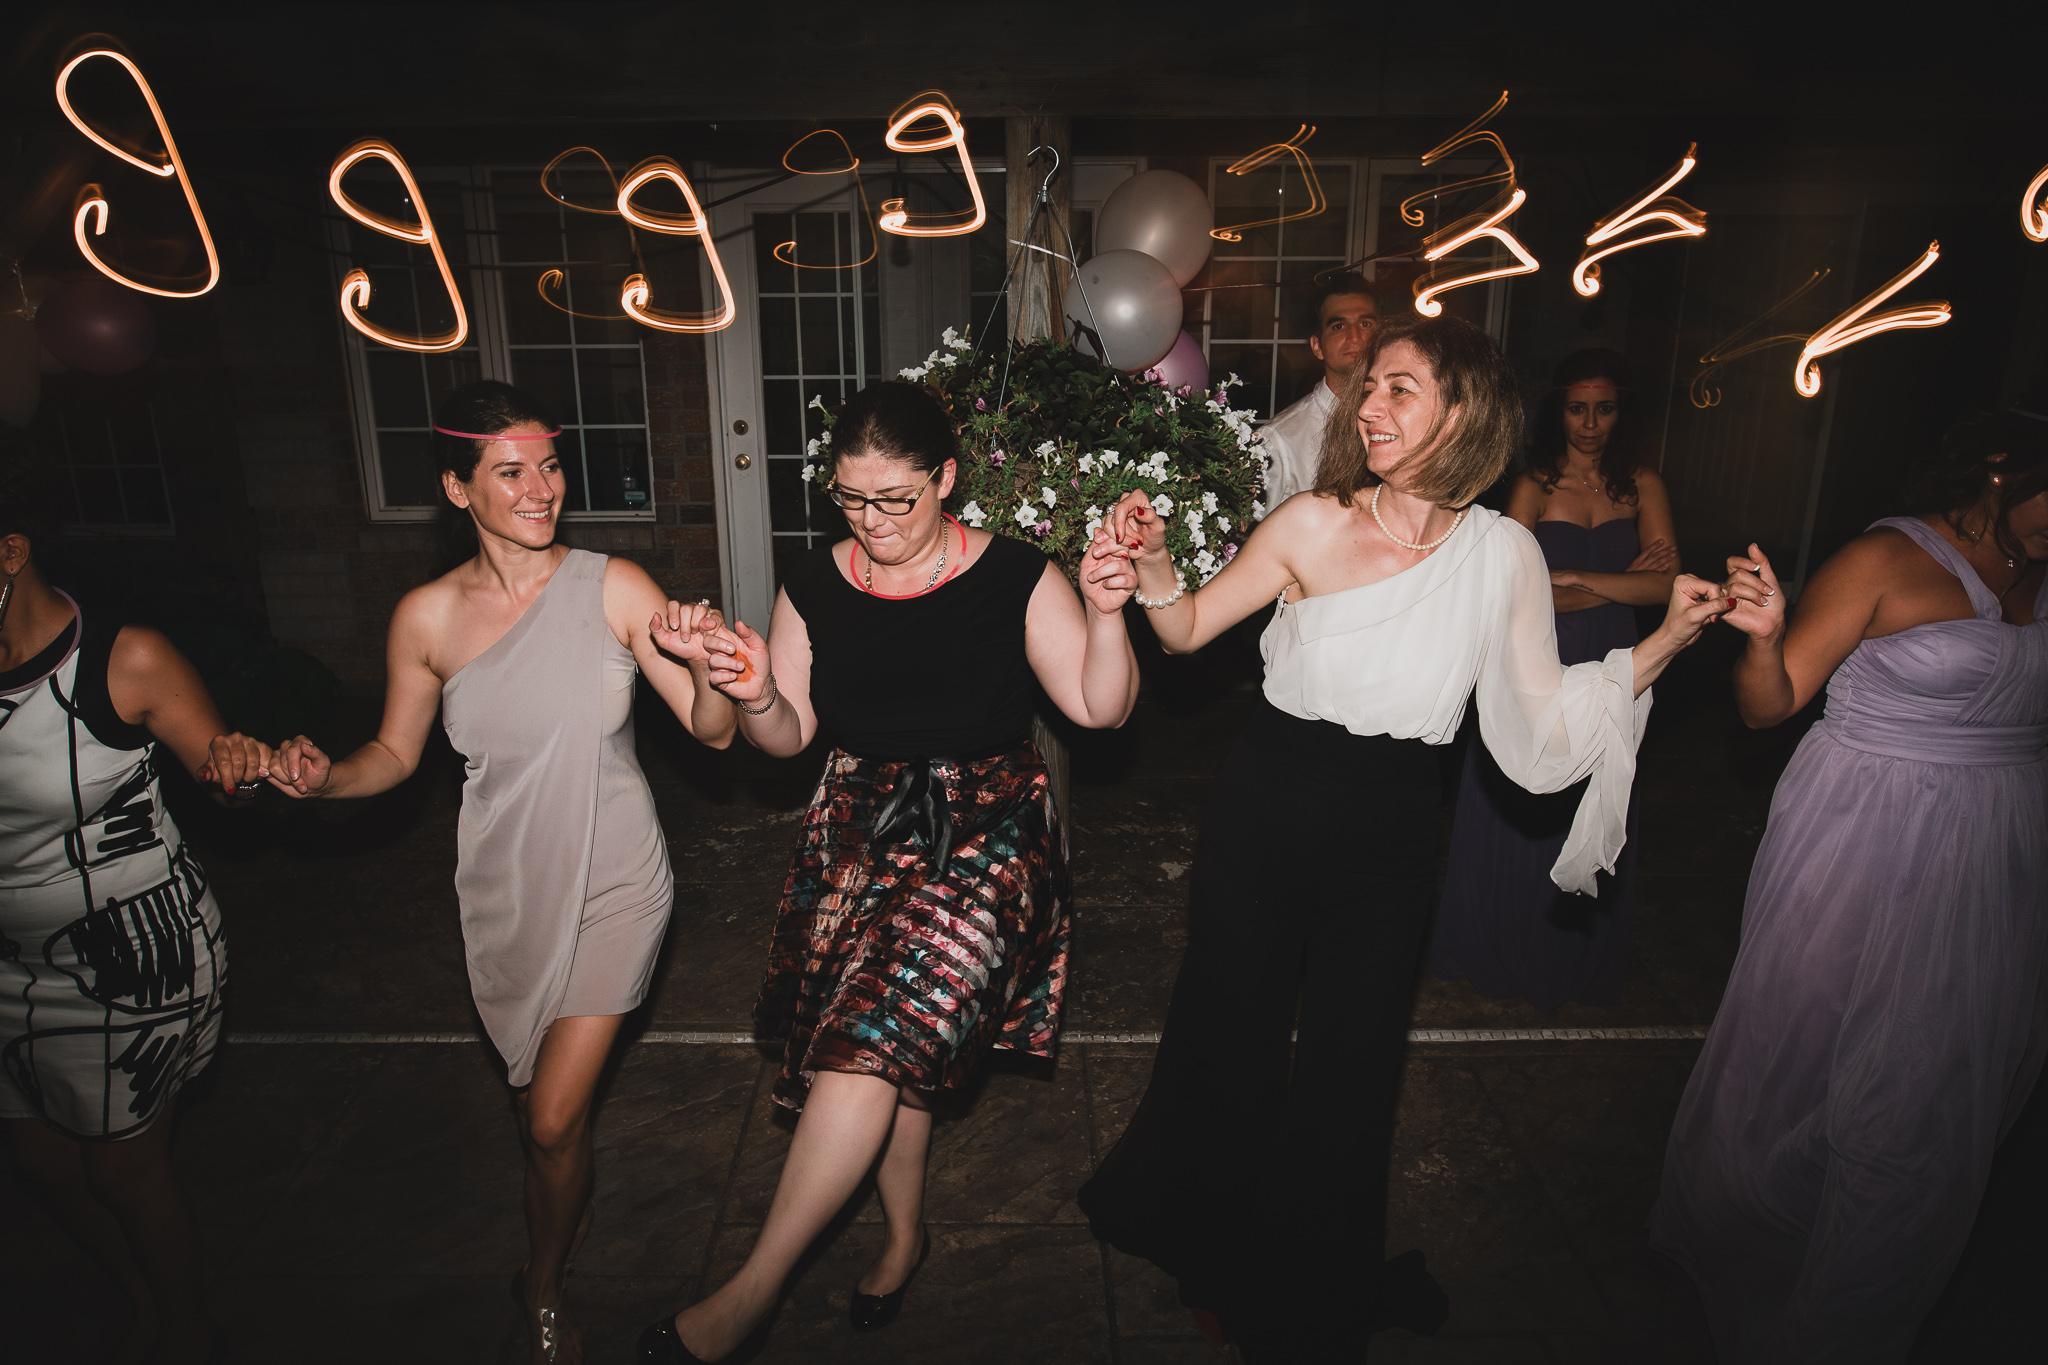 Alternative, moody wedding photos in Ottawa, Carleton Place